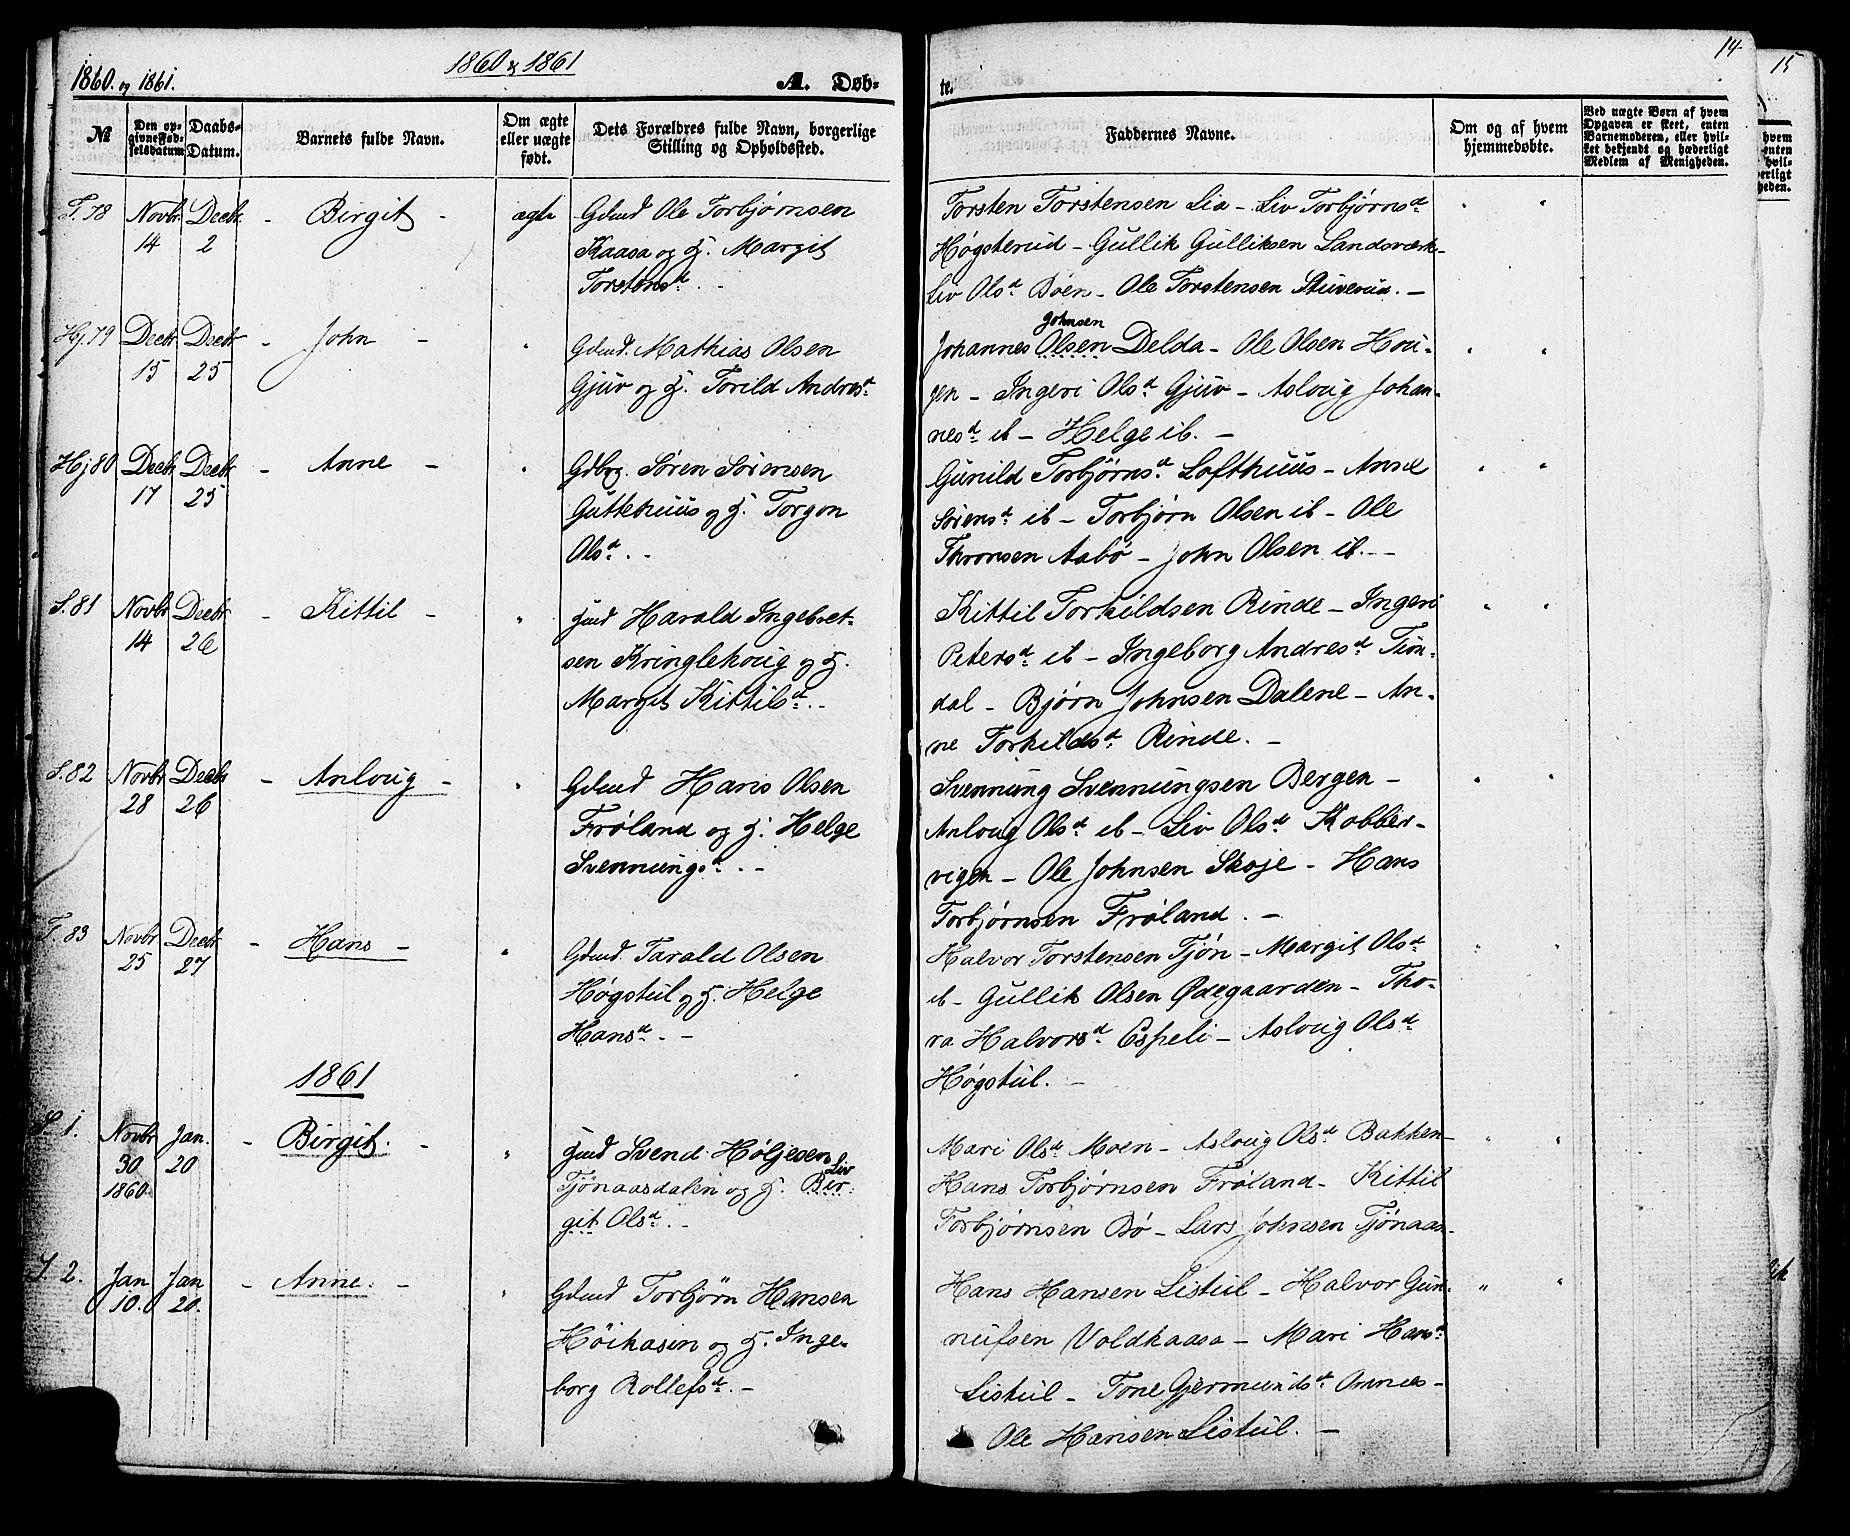 SAKO, Hjartdal kirkebøker, F/Fa/L0009: Ministerialbok nr. I 9, 1860-1879, s. 14